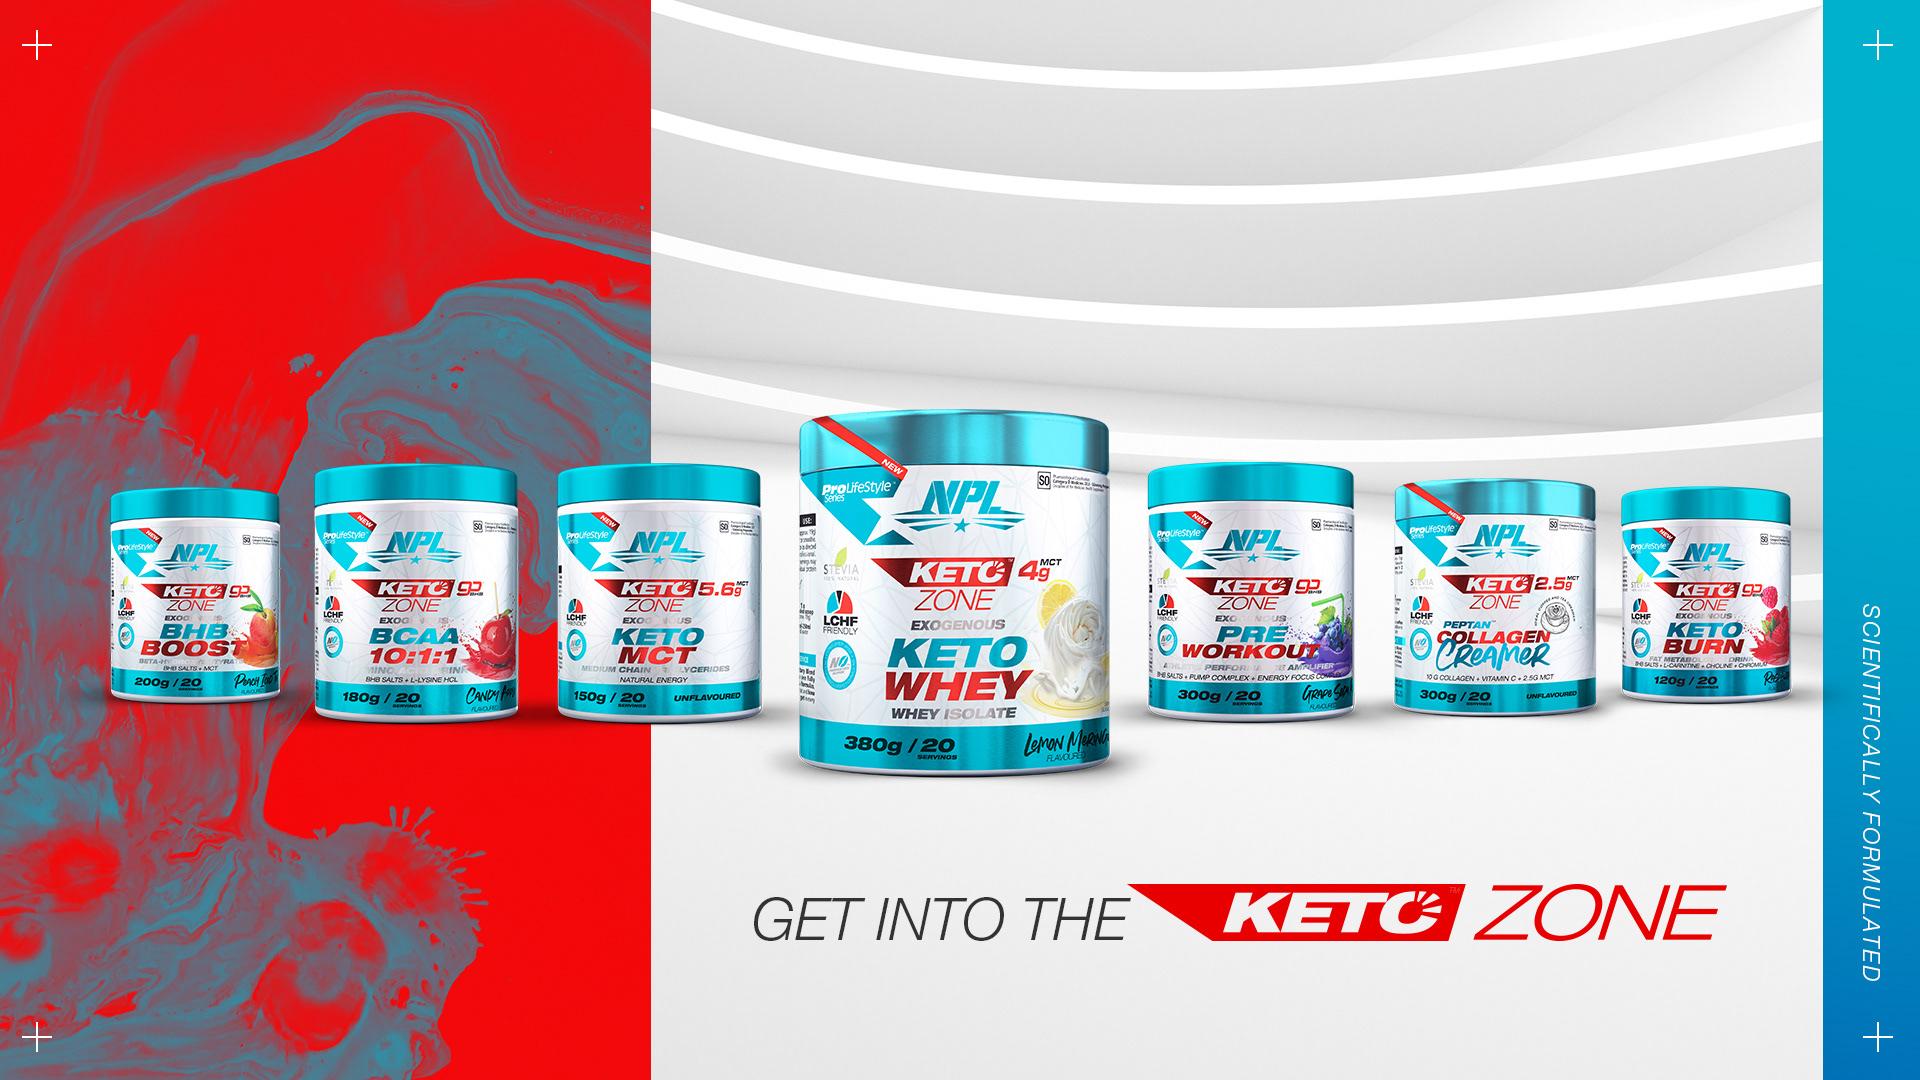 NPL's Keto Zone product range